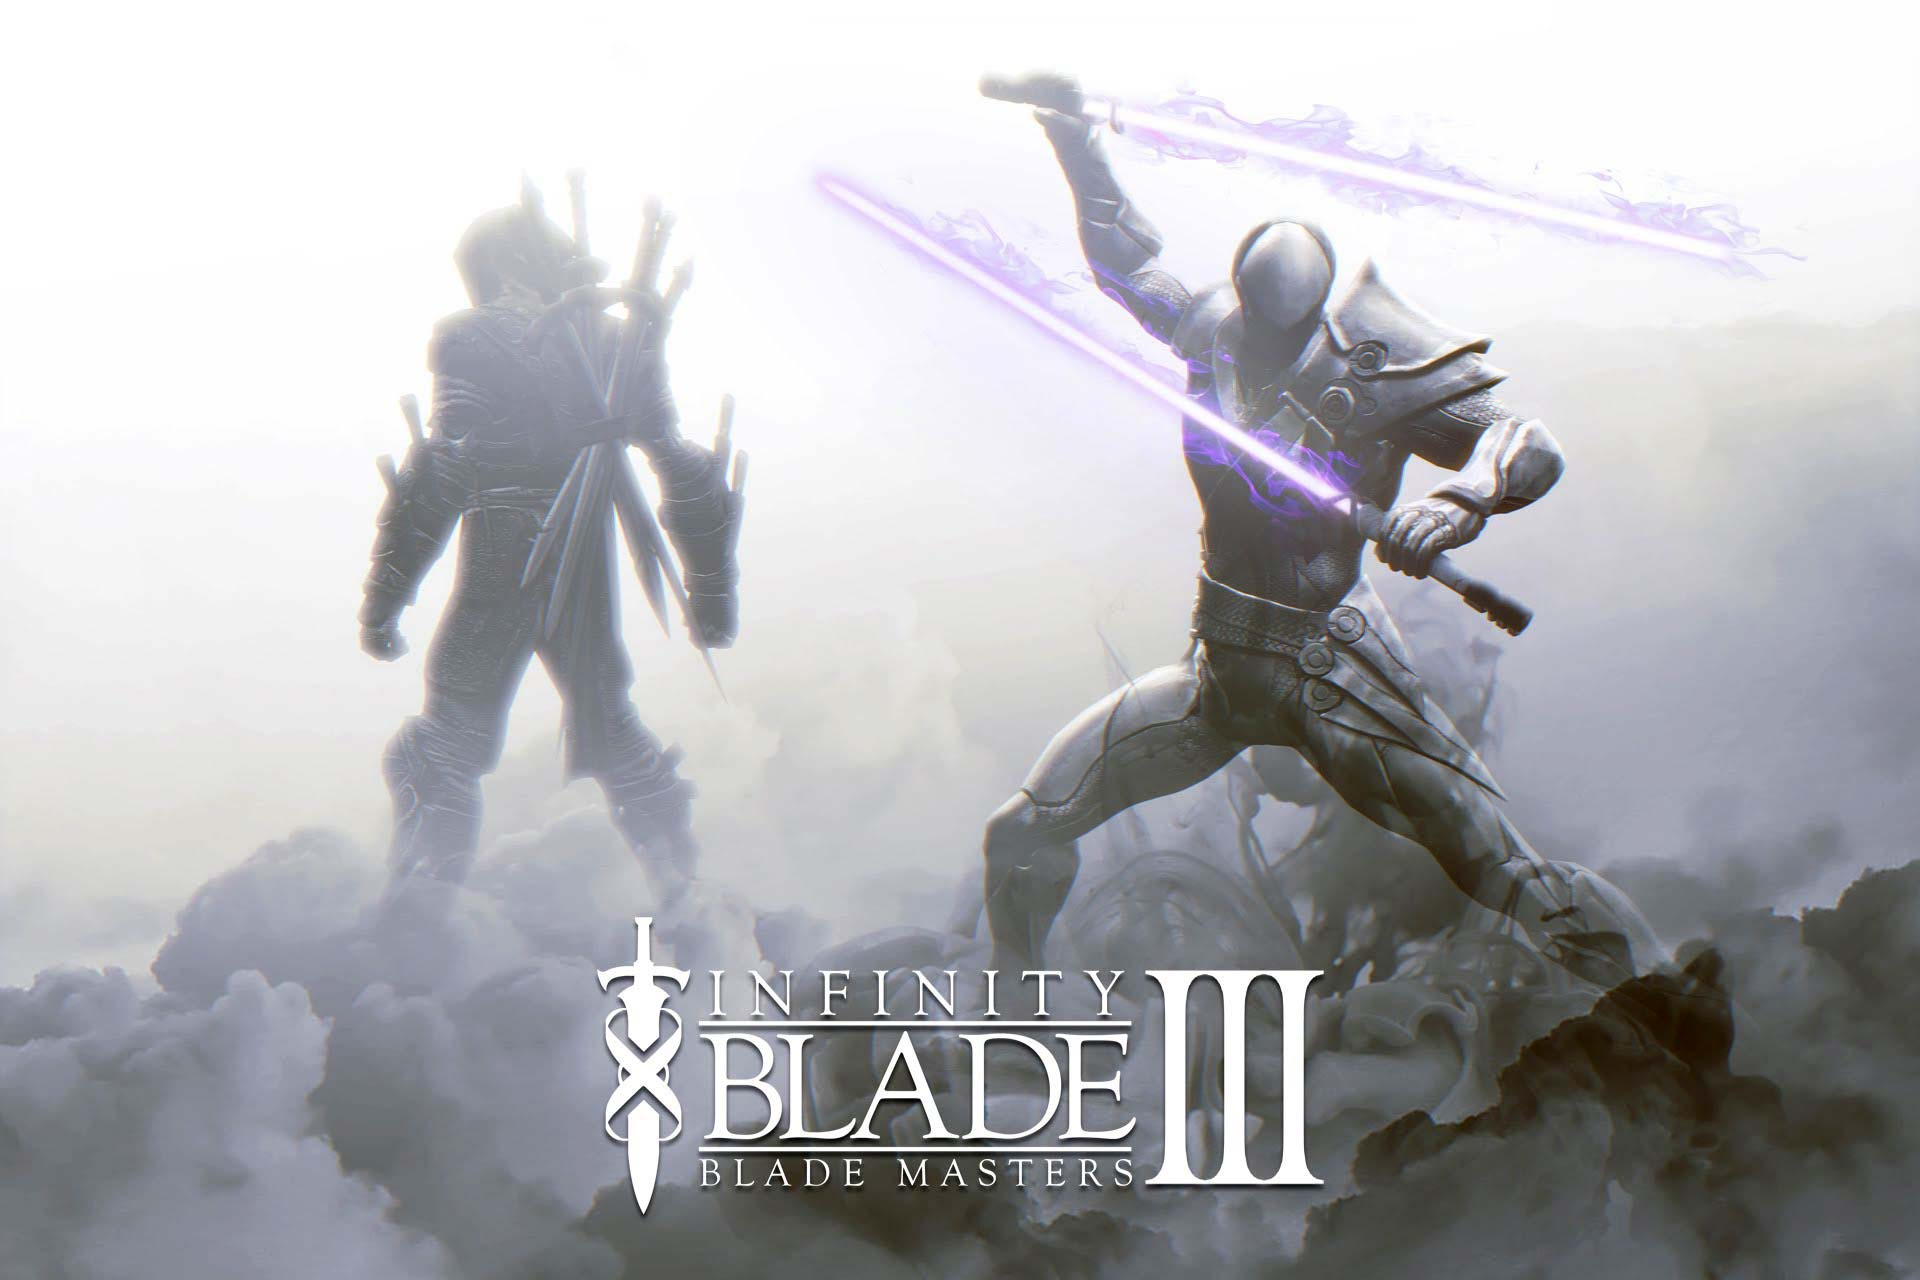 infinity blade III blade masters iOS FSMdotCOMjpg 1920x1280